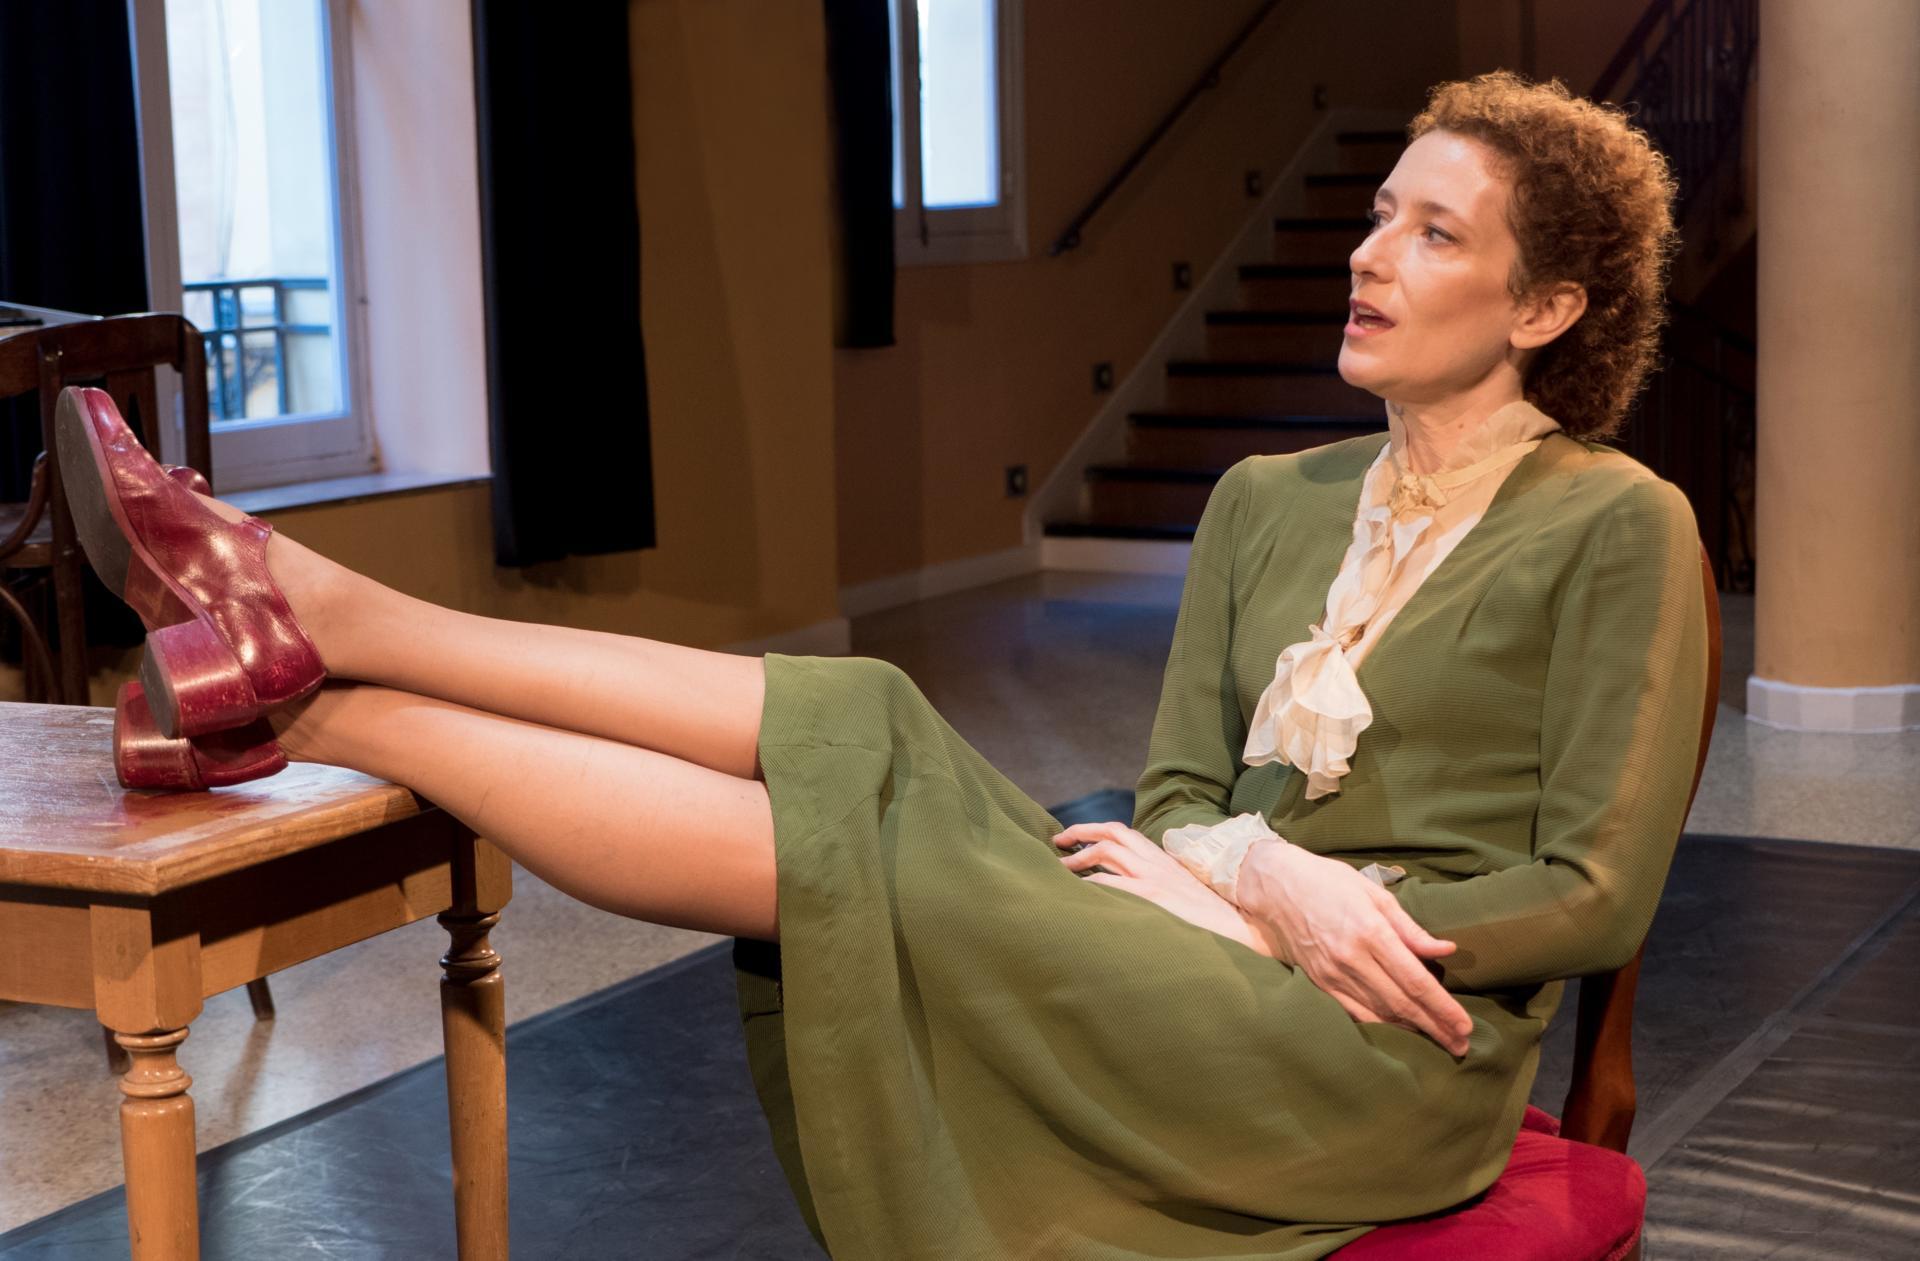 Clara Sanchis protagonitza 'Una habitación propia' a la Sala Beckett. Foto: Isabel de Ocampo i Diego Ruiz